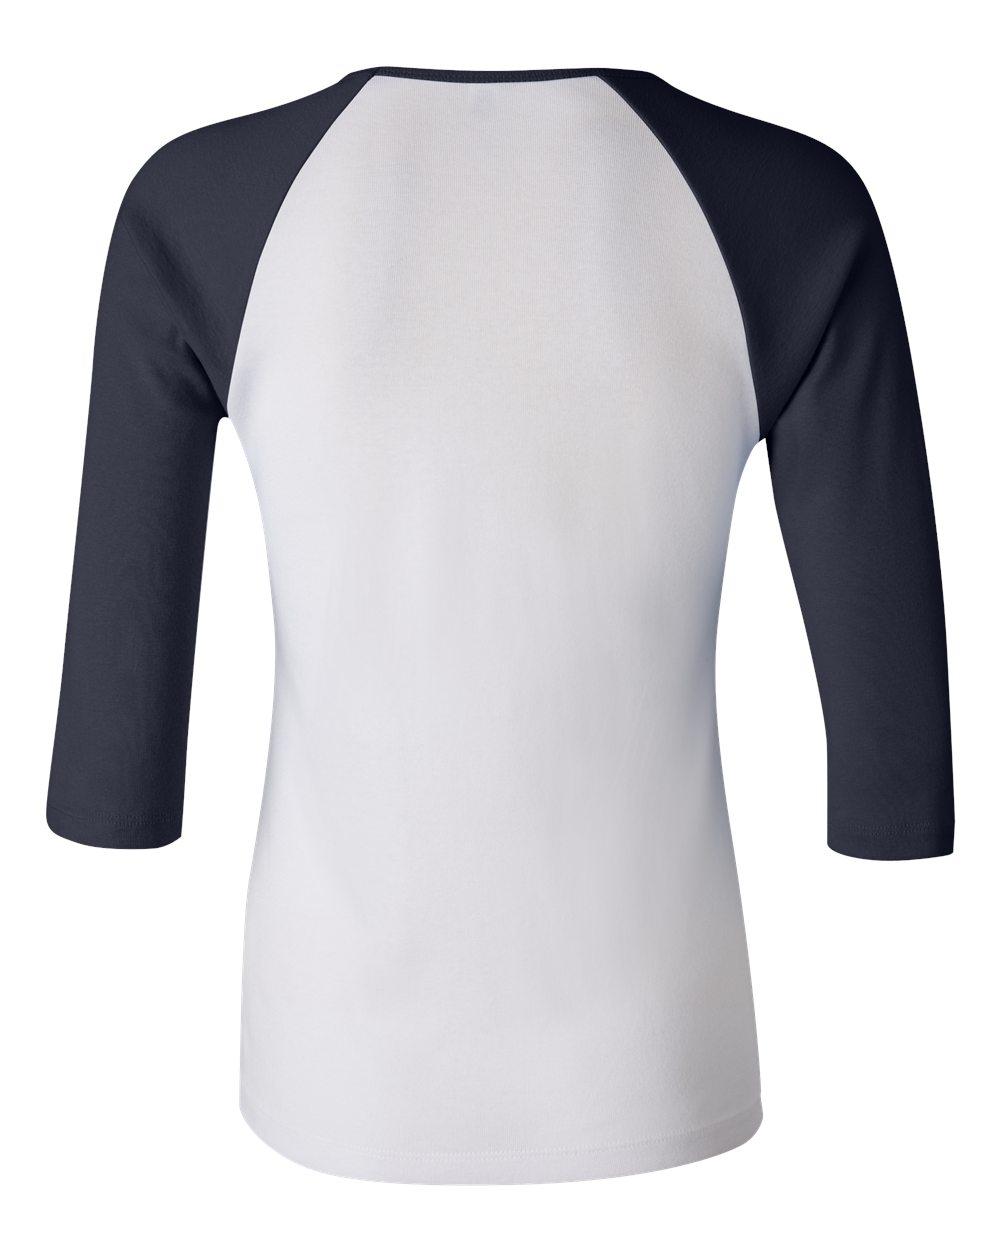 Bella-Canvas-Womens-Stretch-Rib-3-4-Sleeve-Contrast-Raglan-T-Shirt-B2000 thumbnail 20